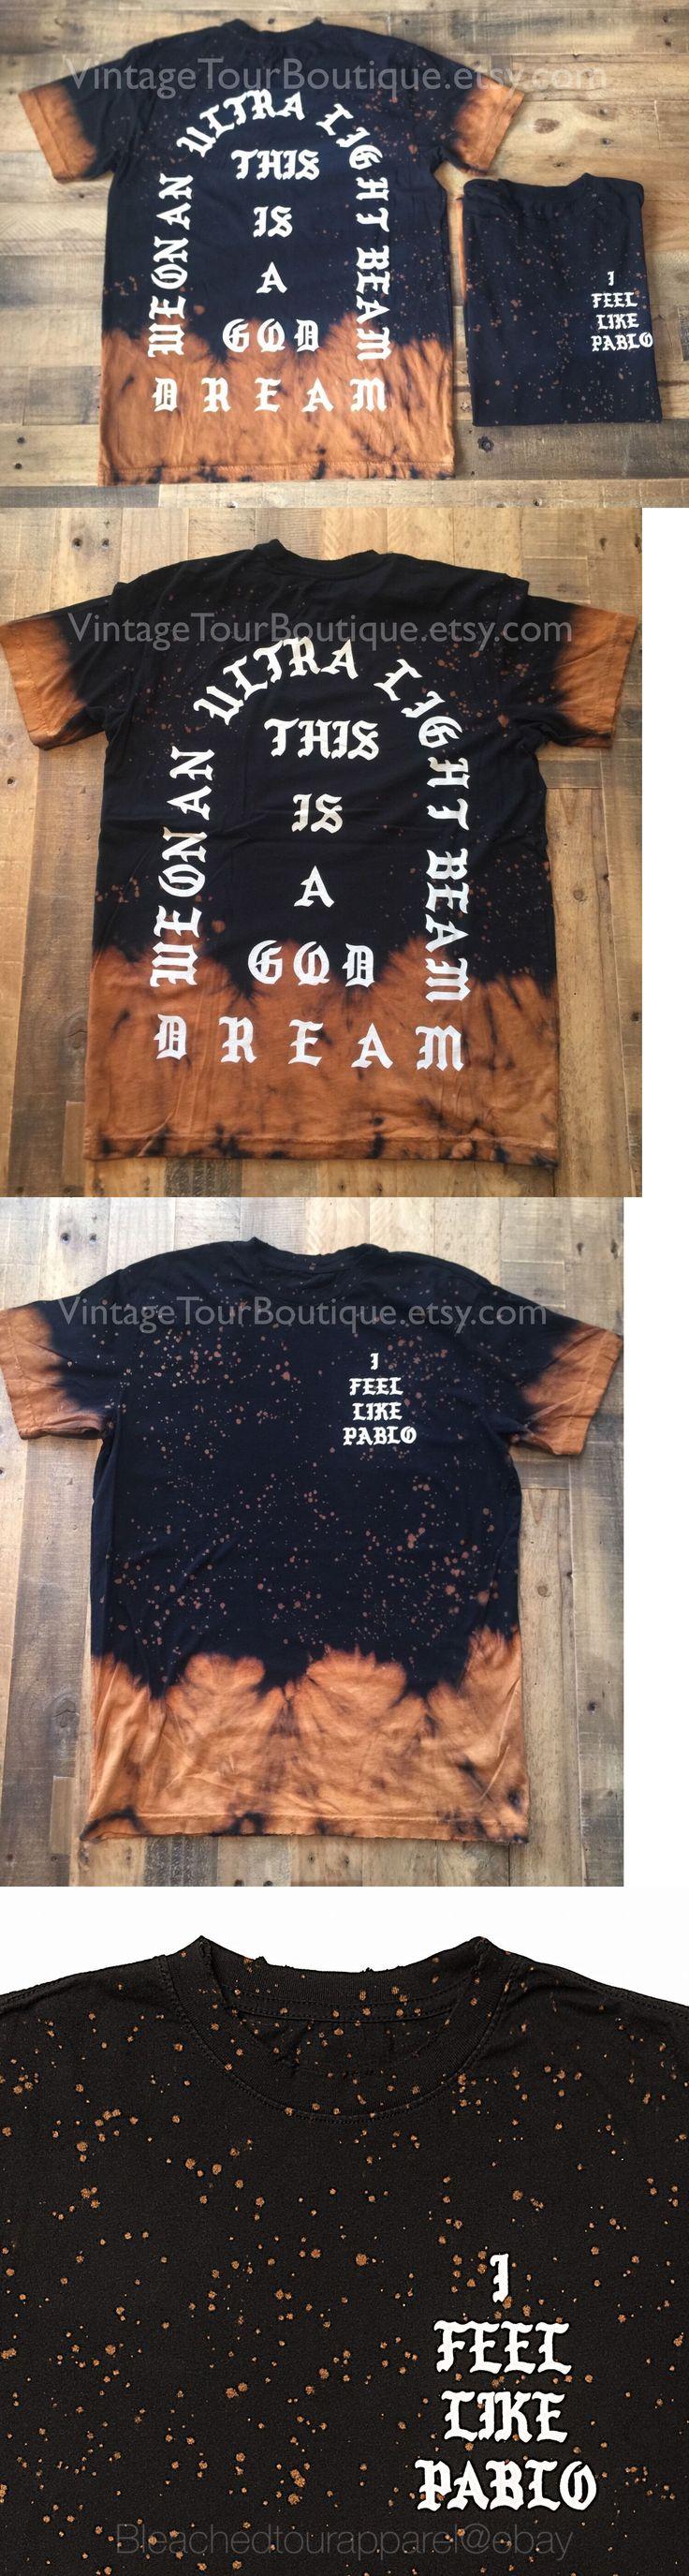 Black keys t shirt etsy - T Shirts 175781 I Feel Like Pablo Bleached Tee Kanye West Yeezy Yeezus Tlop